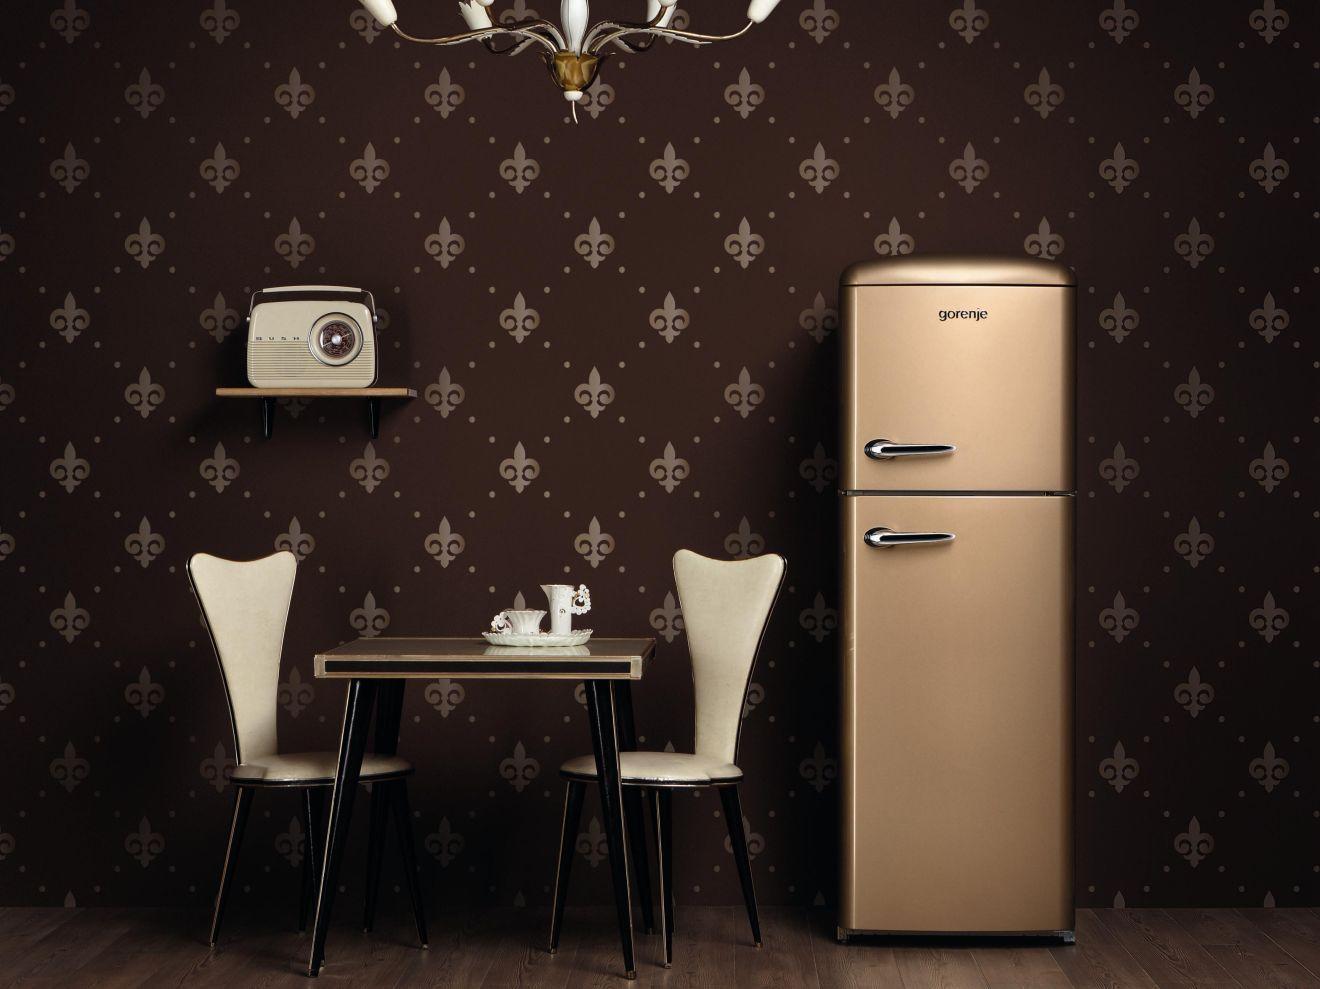 Gorenje Retro Collection Gorenje Retro Refrigerator Retro Appliances Vintage Refrigerator